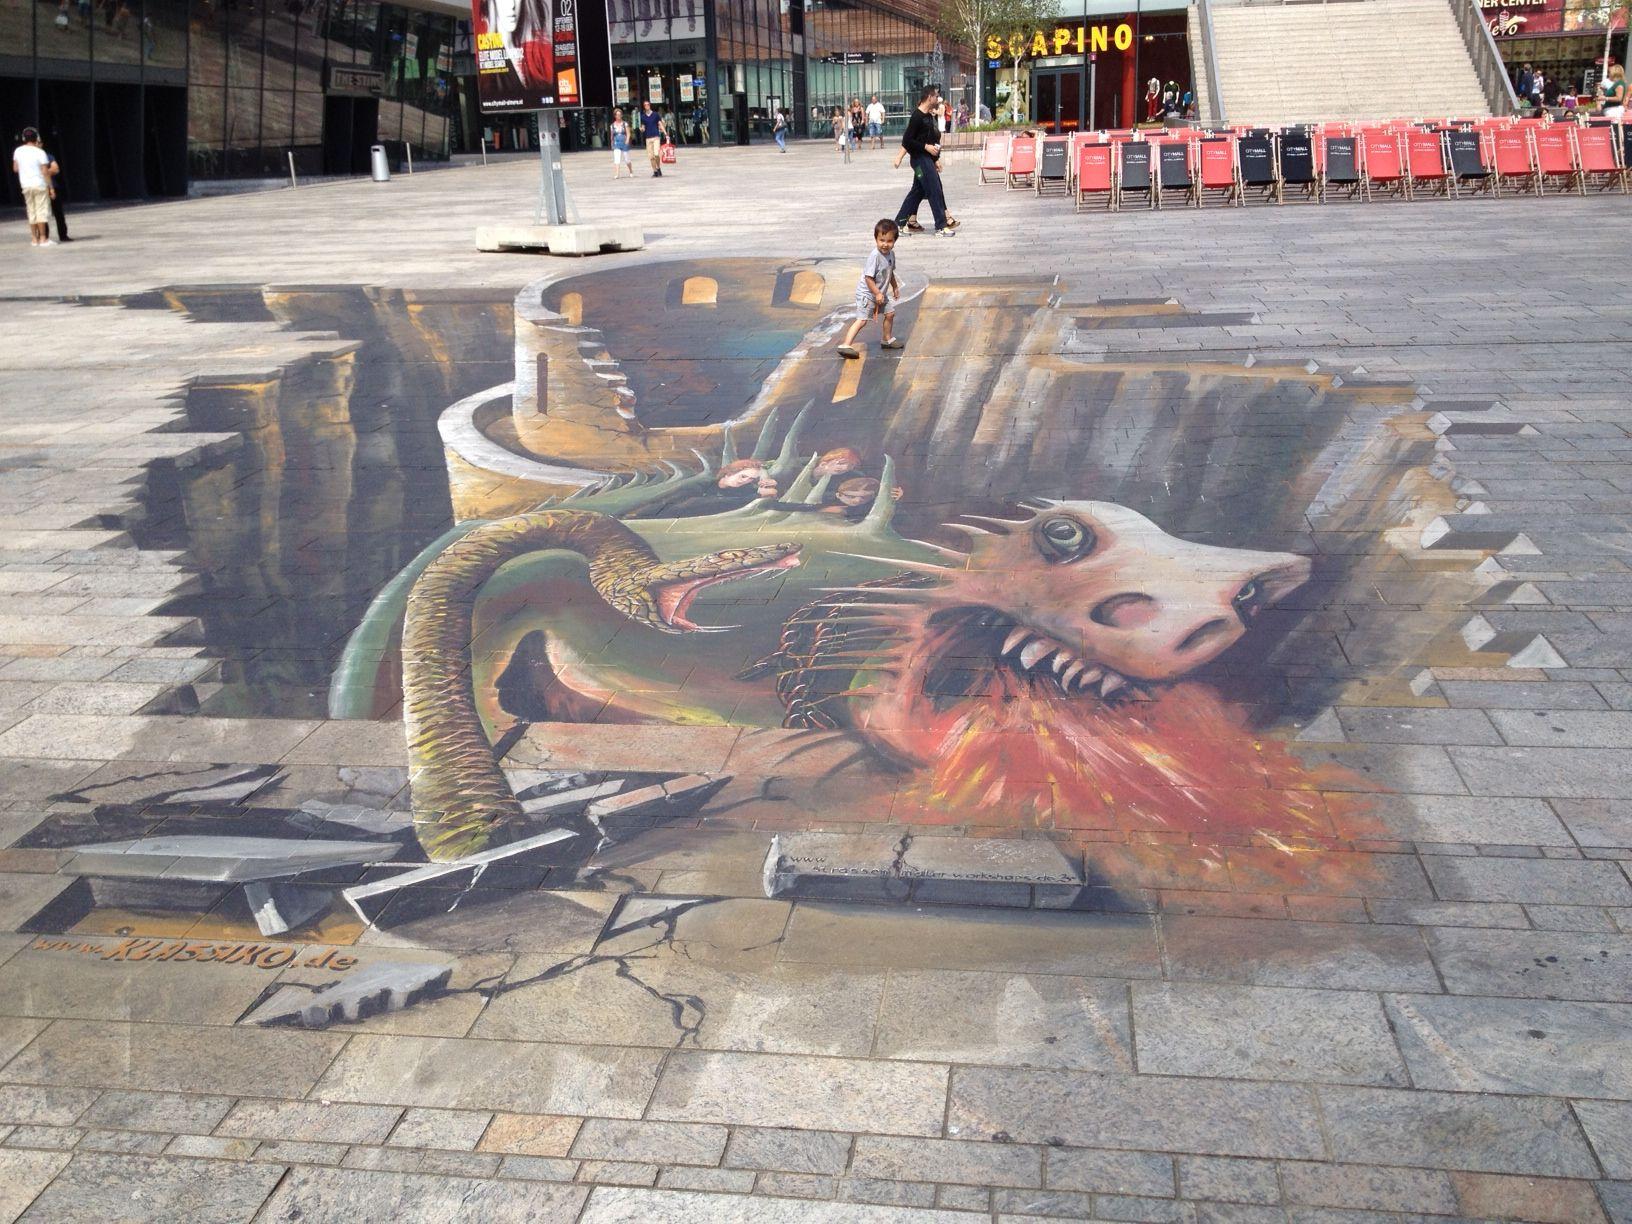 3D painting #Streetart, Almere, The Netherlands ©Copyright photo Rick van der Linden 2012